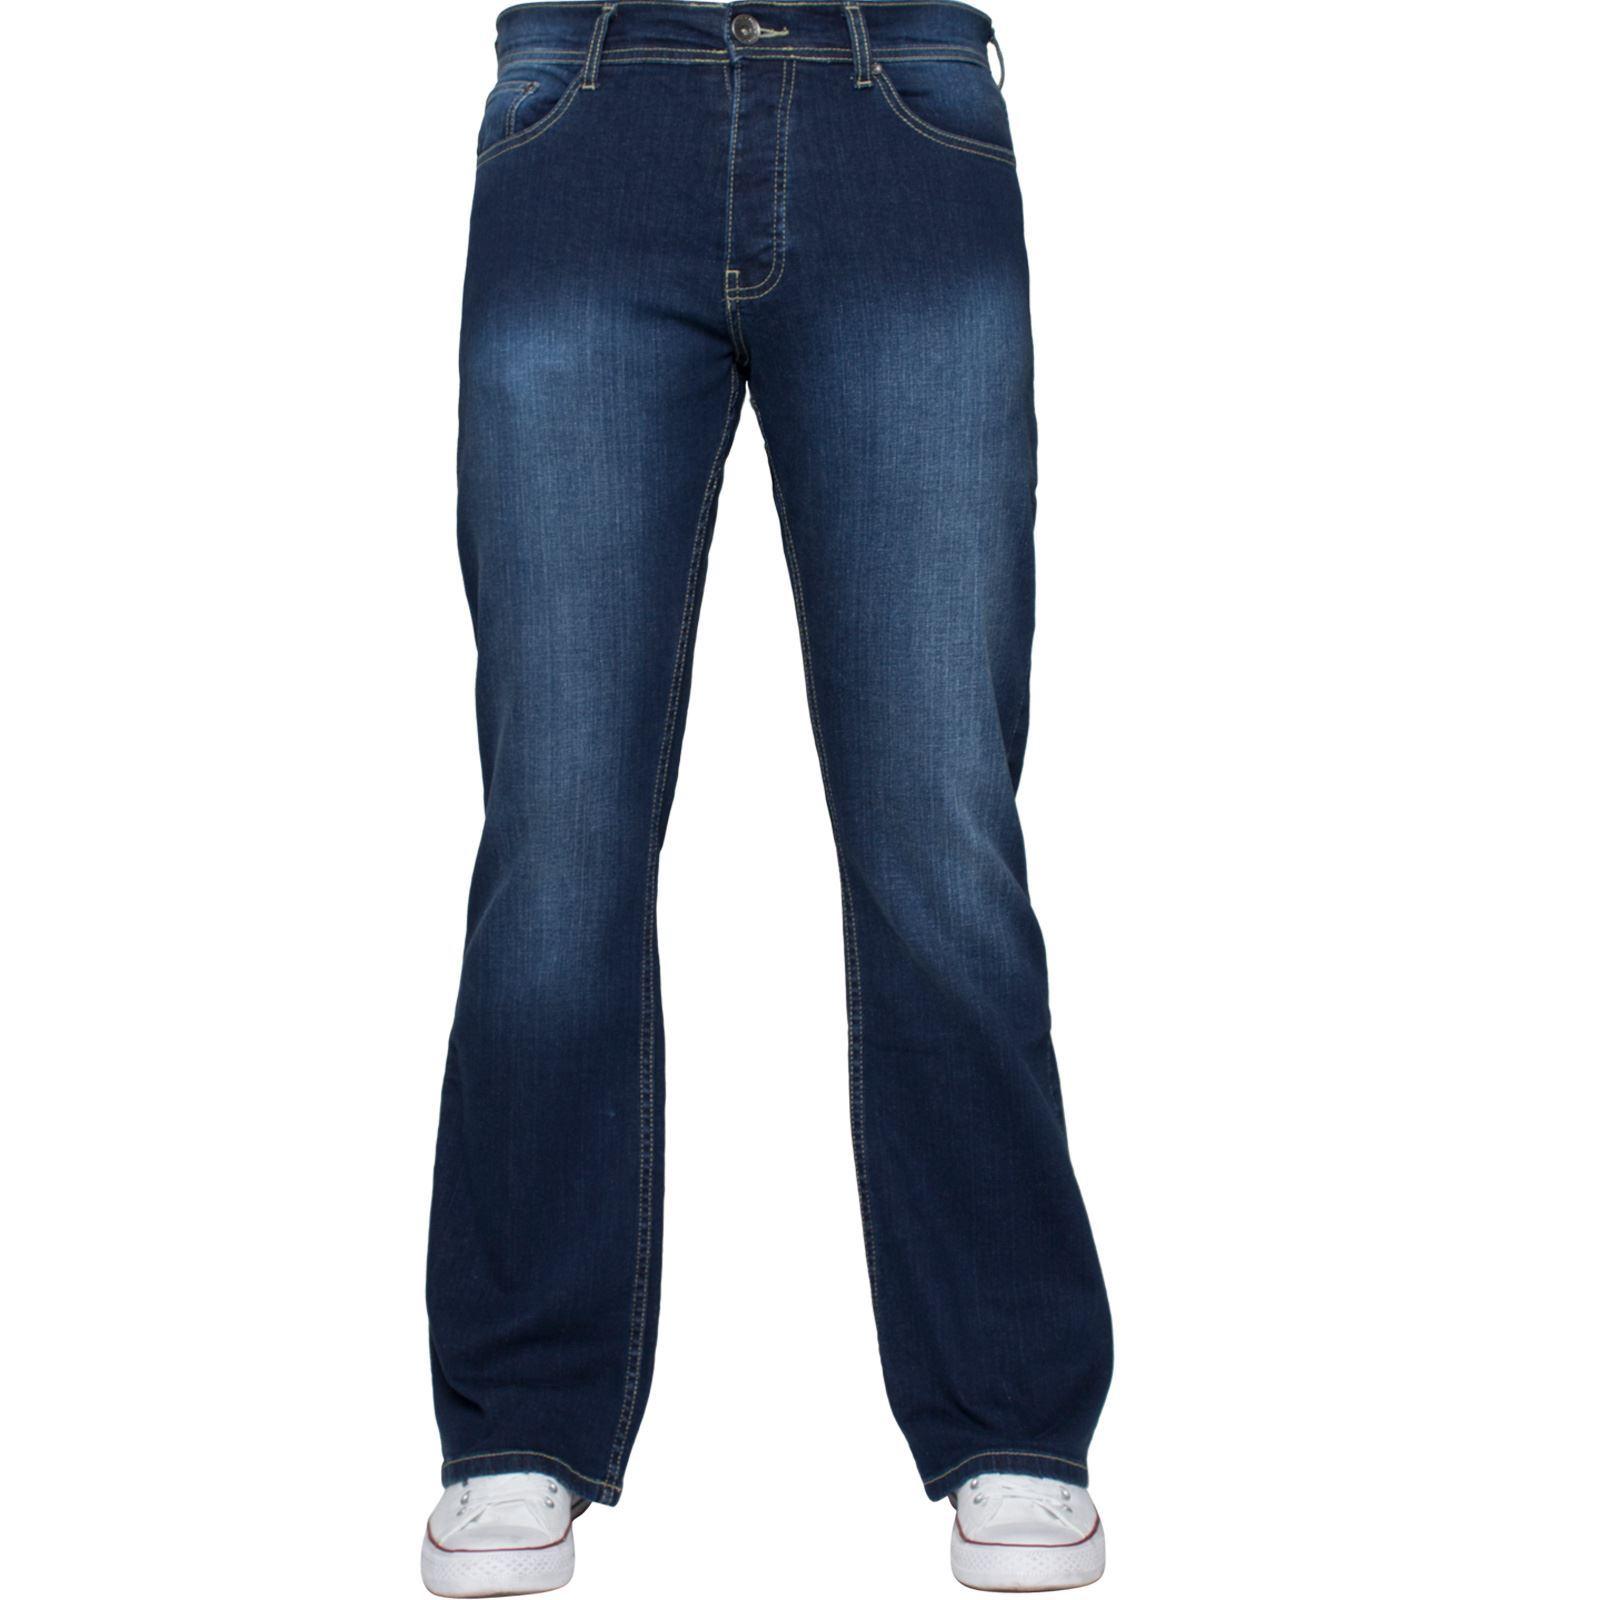 Para-Hombre-Pierna-Recta-Bootcut-Stretch-Denim-Regulares-Pantalon-de-trabajo-Kruze-Todas-Cinturas miniatura 59